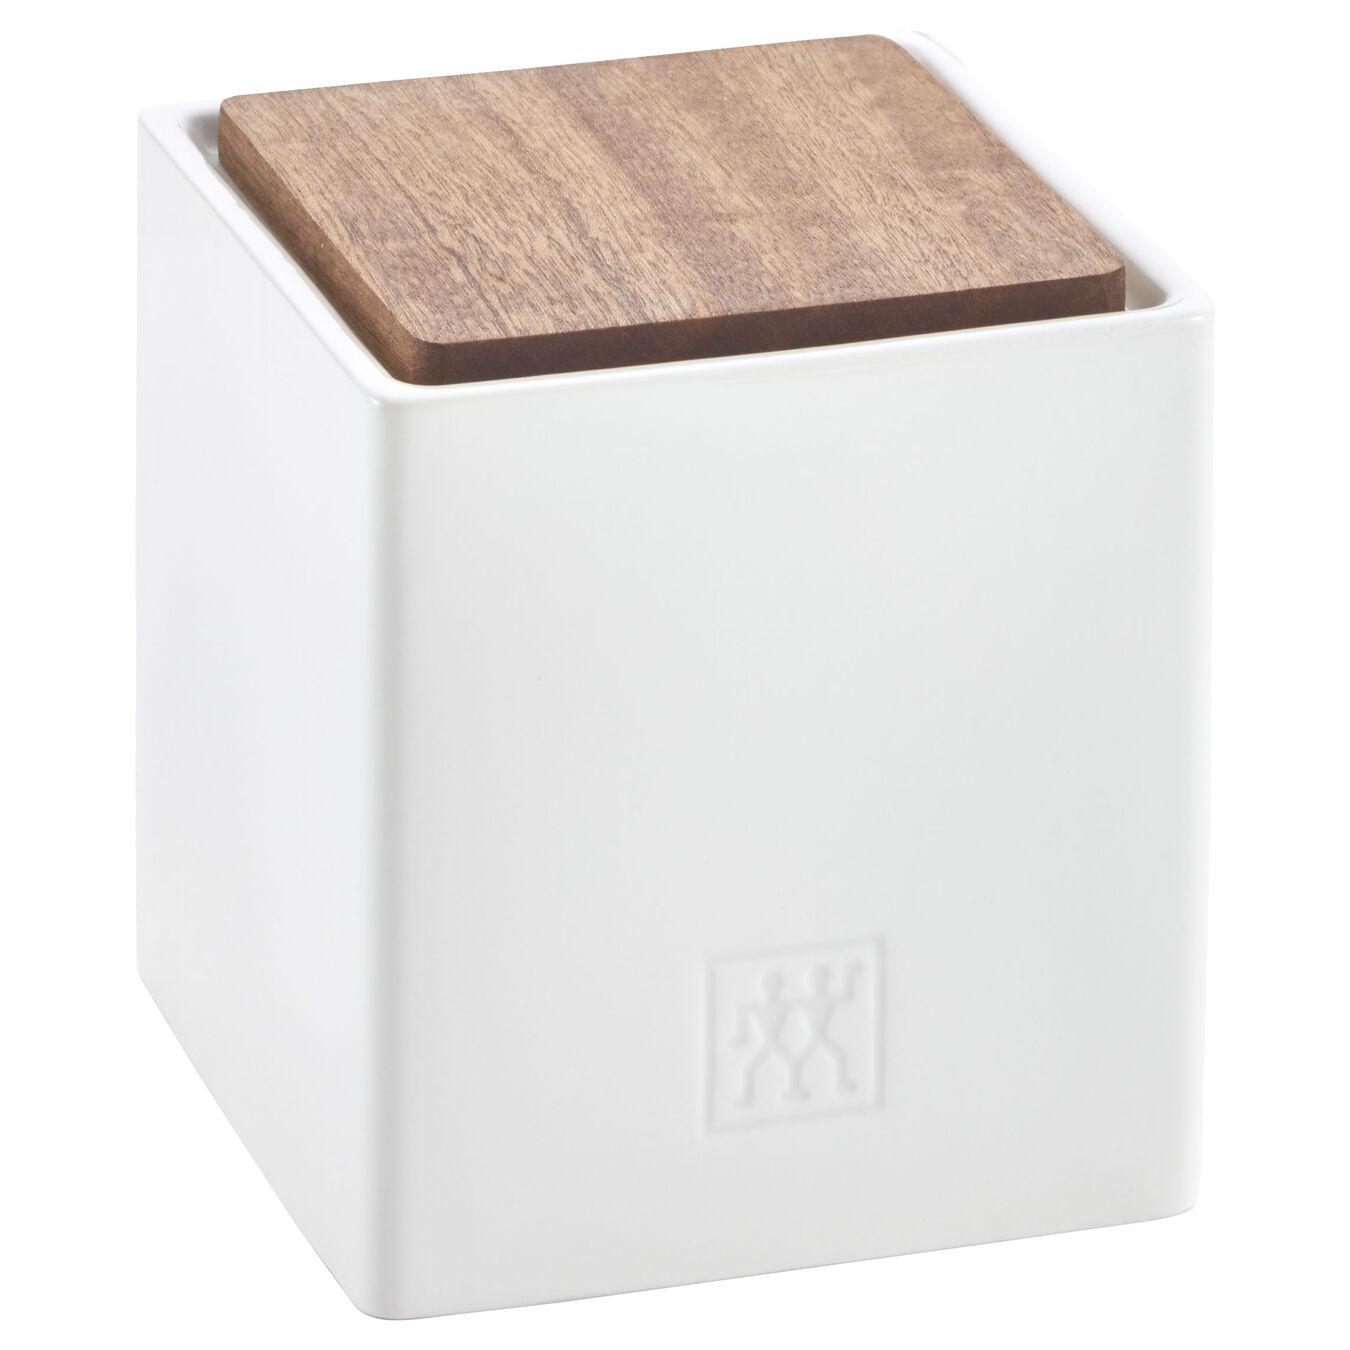 Ceramic Storage Box With Herb Planter,,large 1